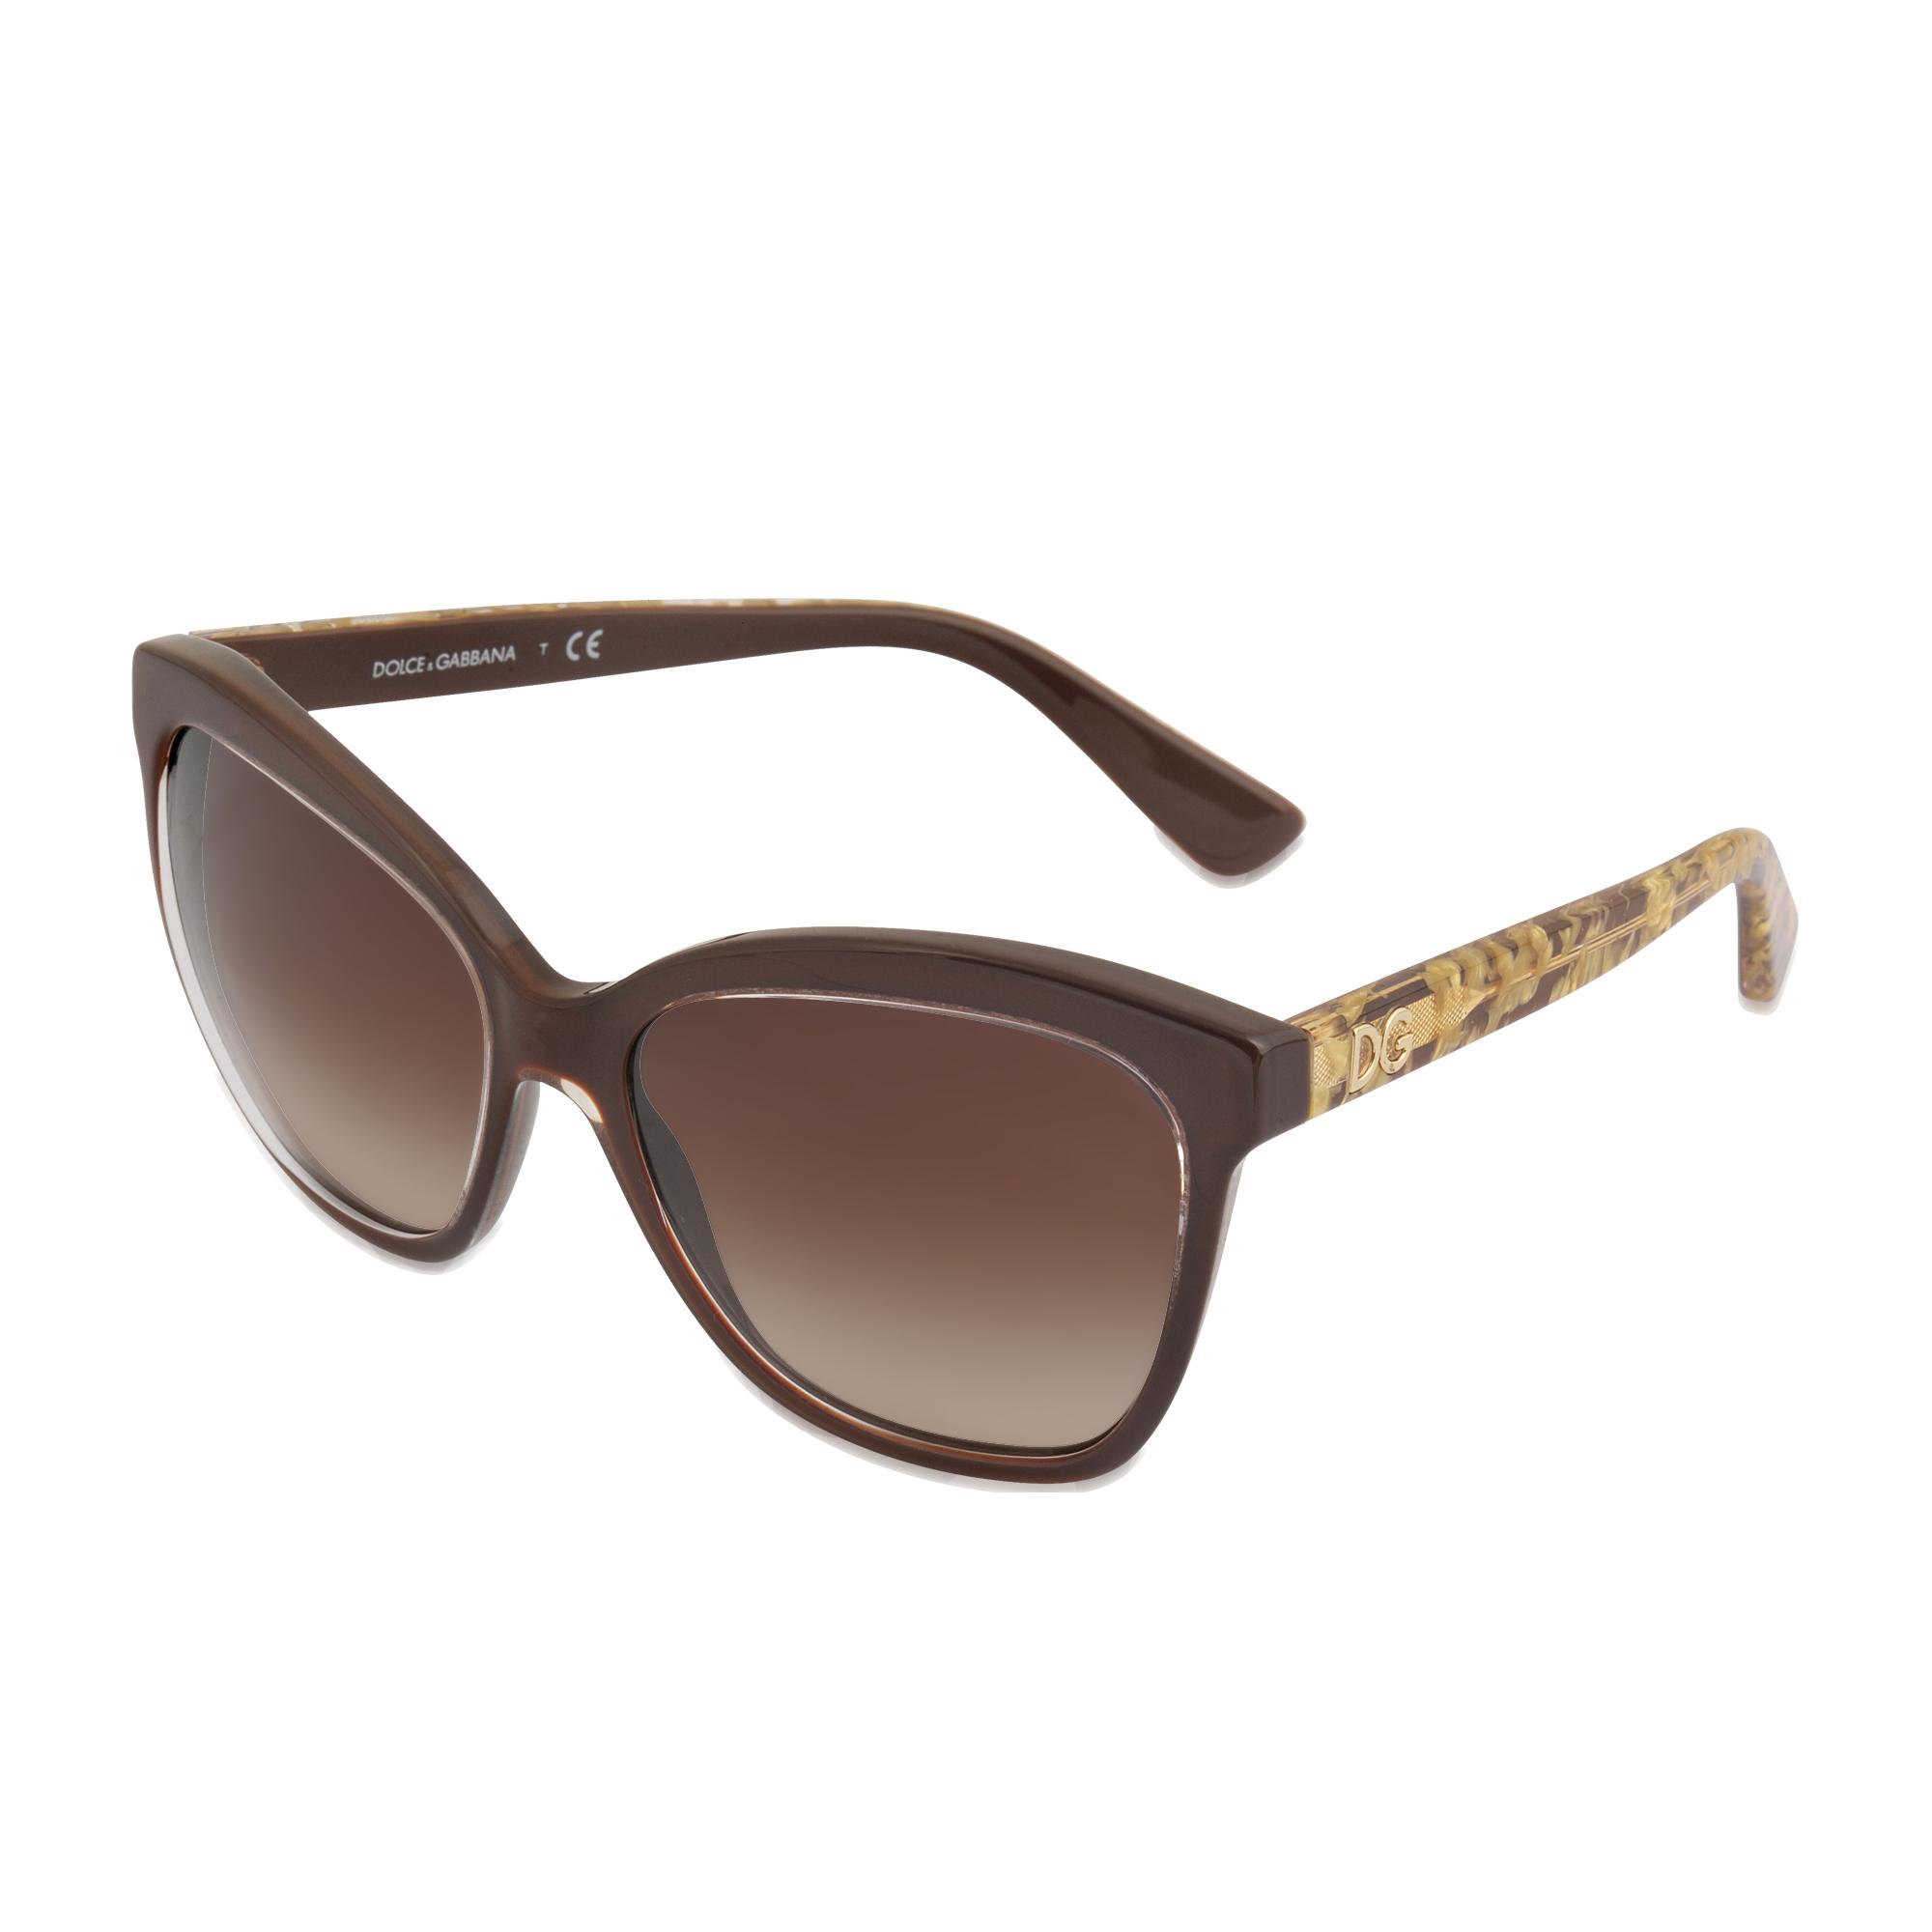 Dolce   Gabbana Butterfly Sunglasses Brown  271466d32810f